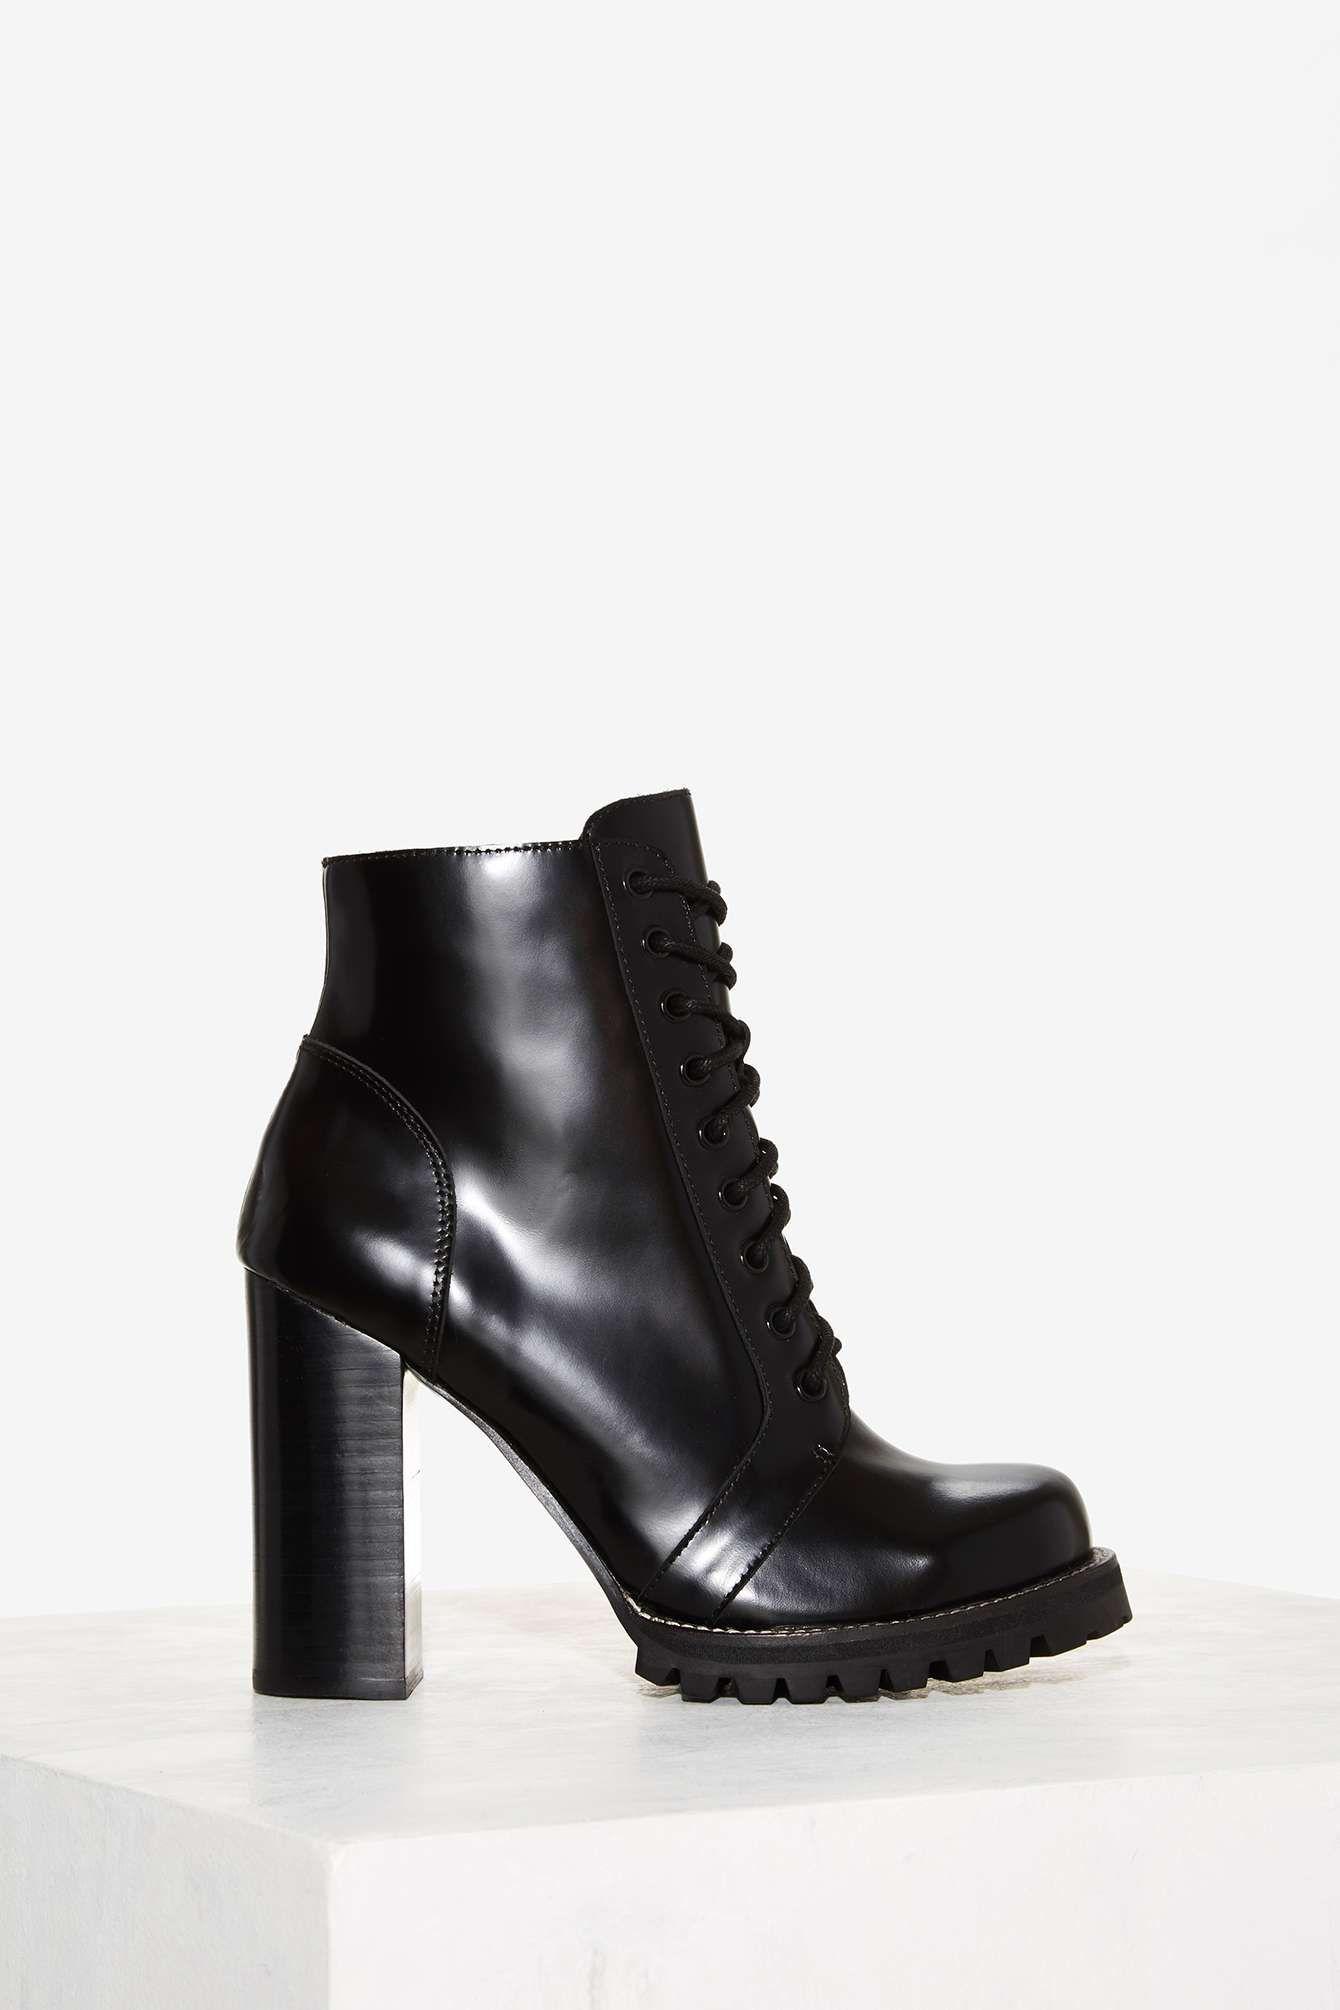 Jeffrey Campbell Women's 'Legion' High Heel Boot 6WGjbY